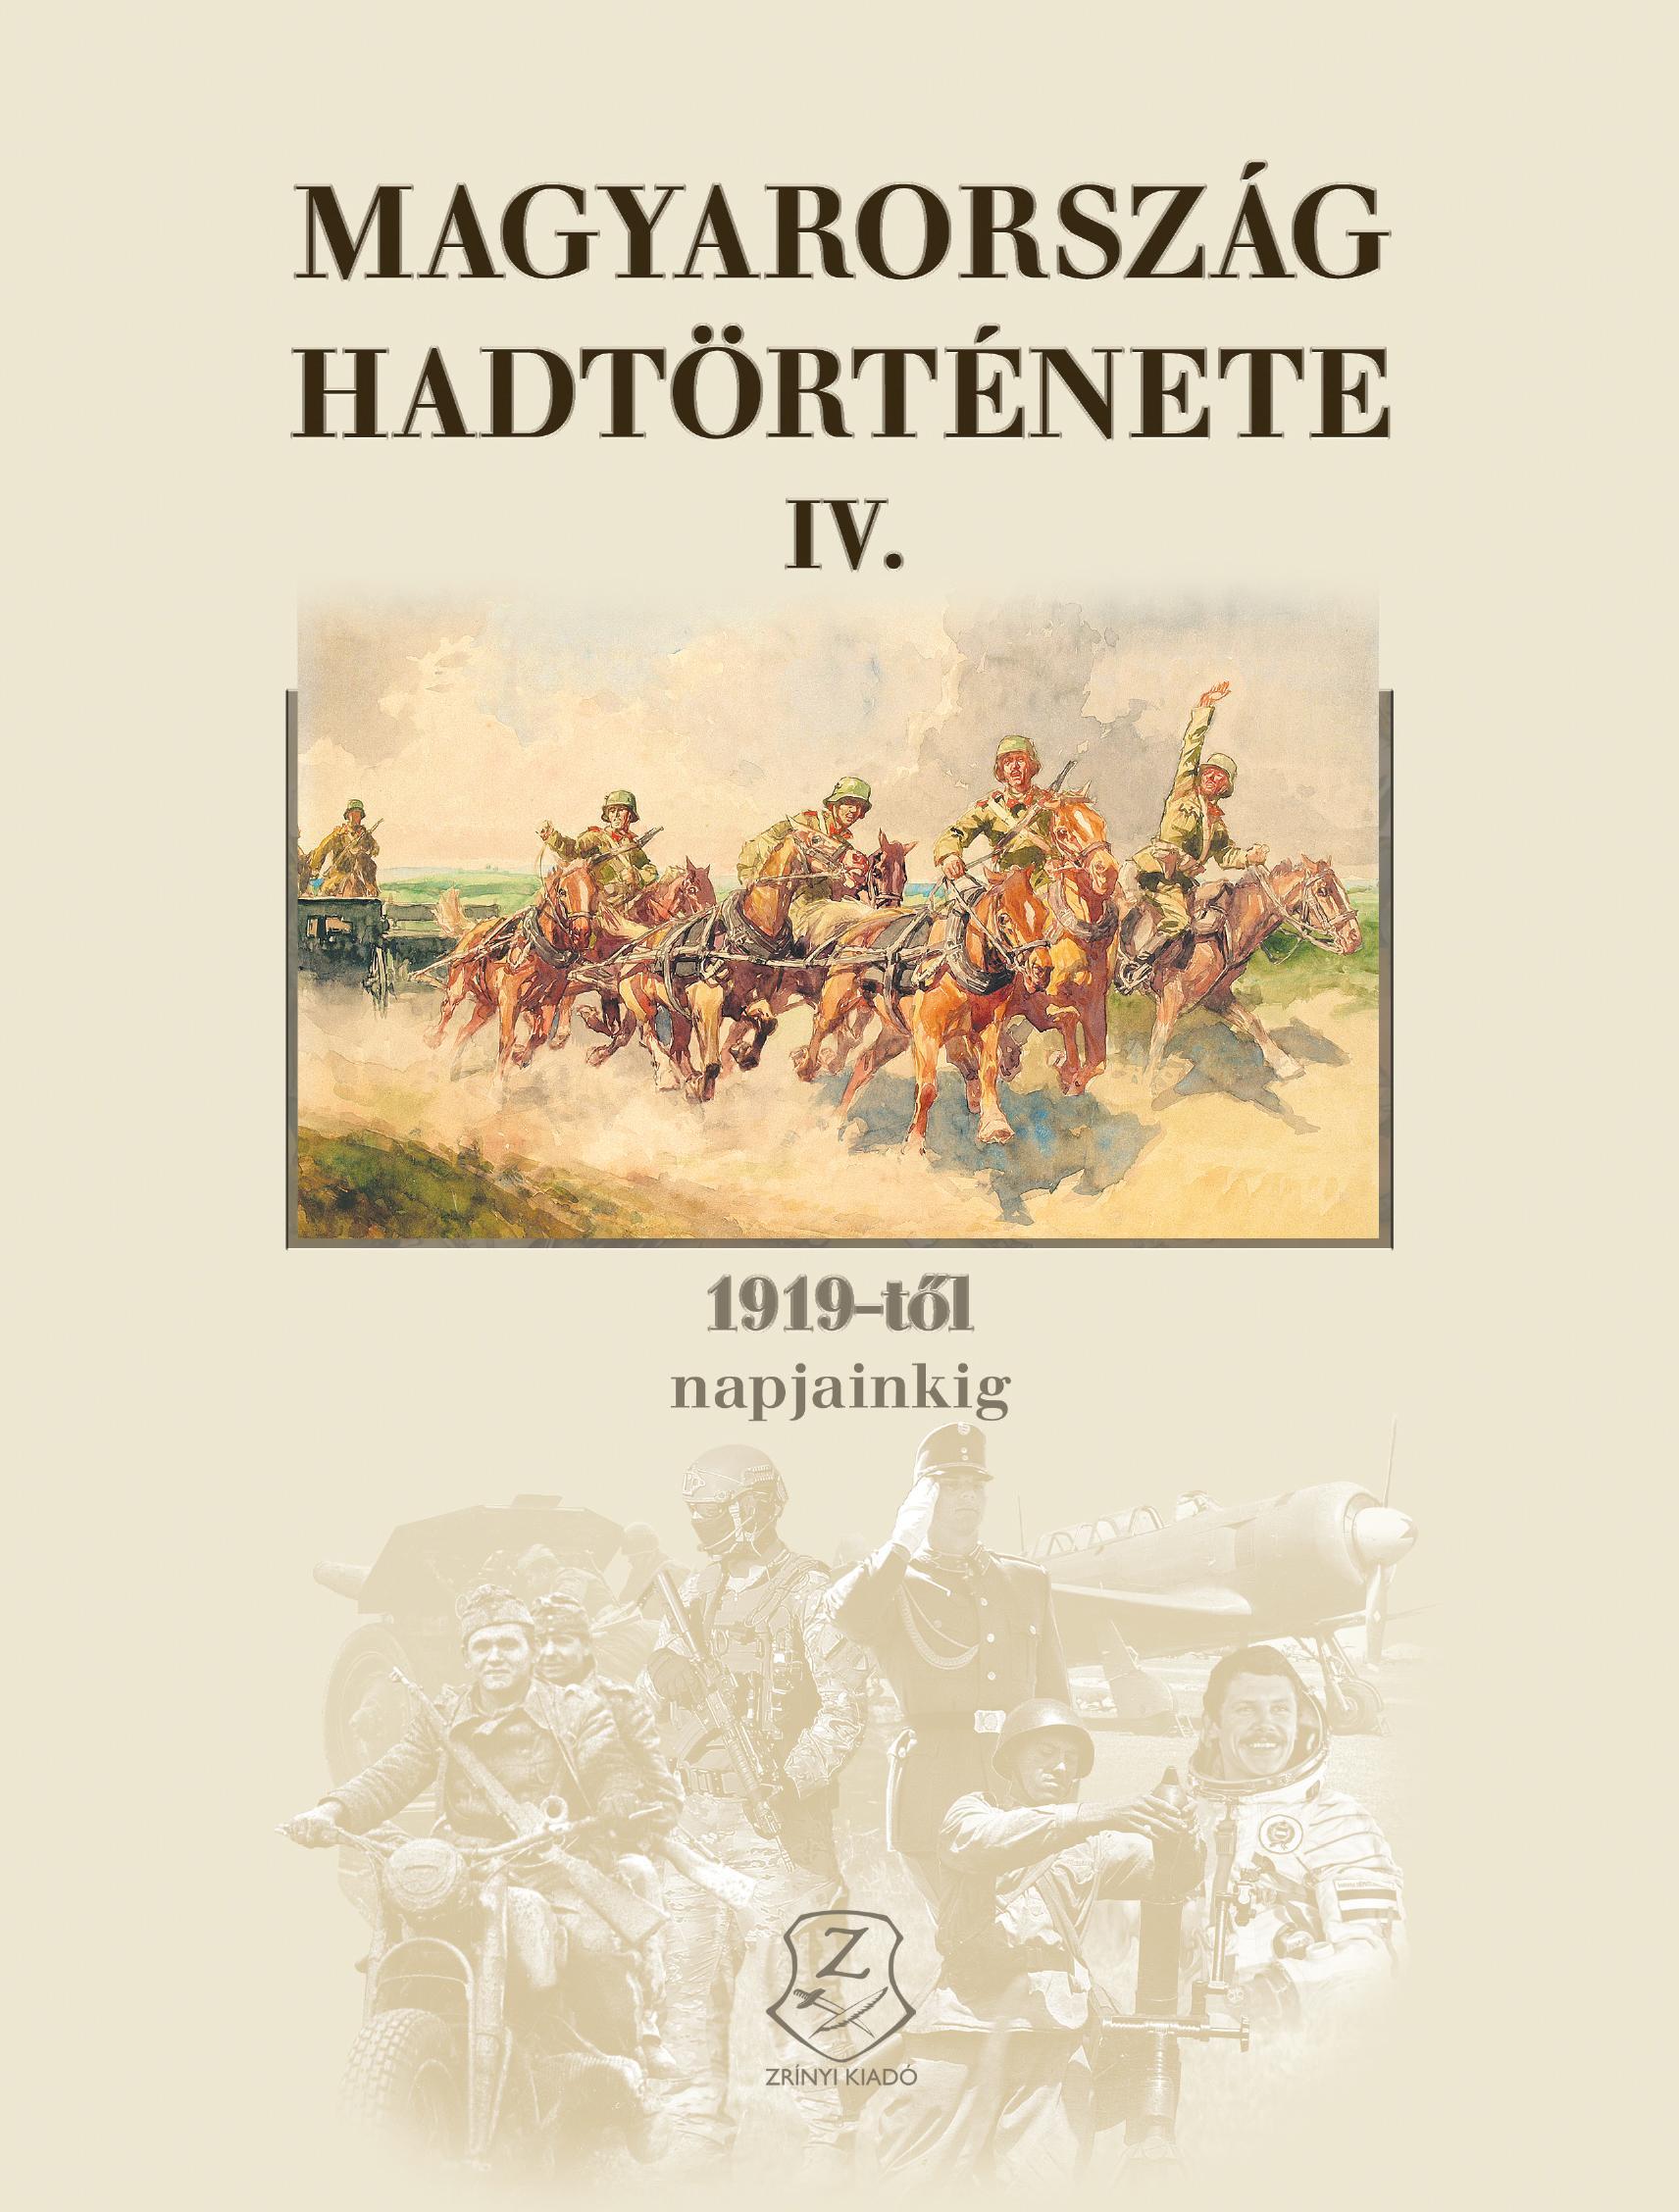 MAGYARORSZÁG HADTÖRTÉNETE IV. - 1919-TÕL NAPJAINKIG